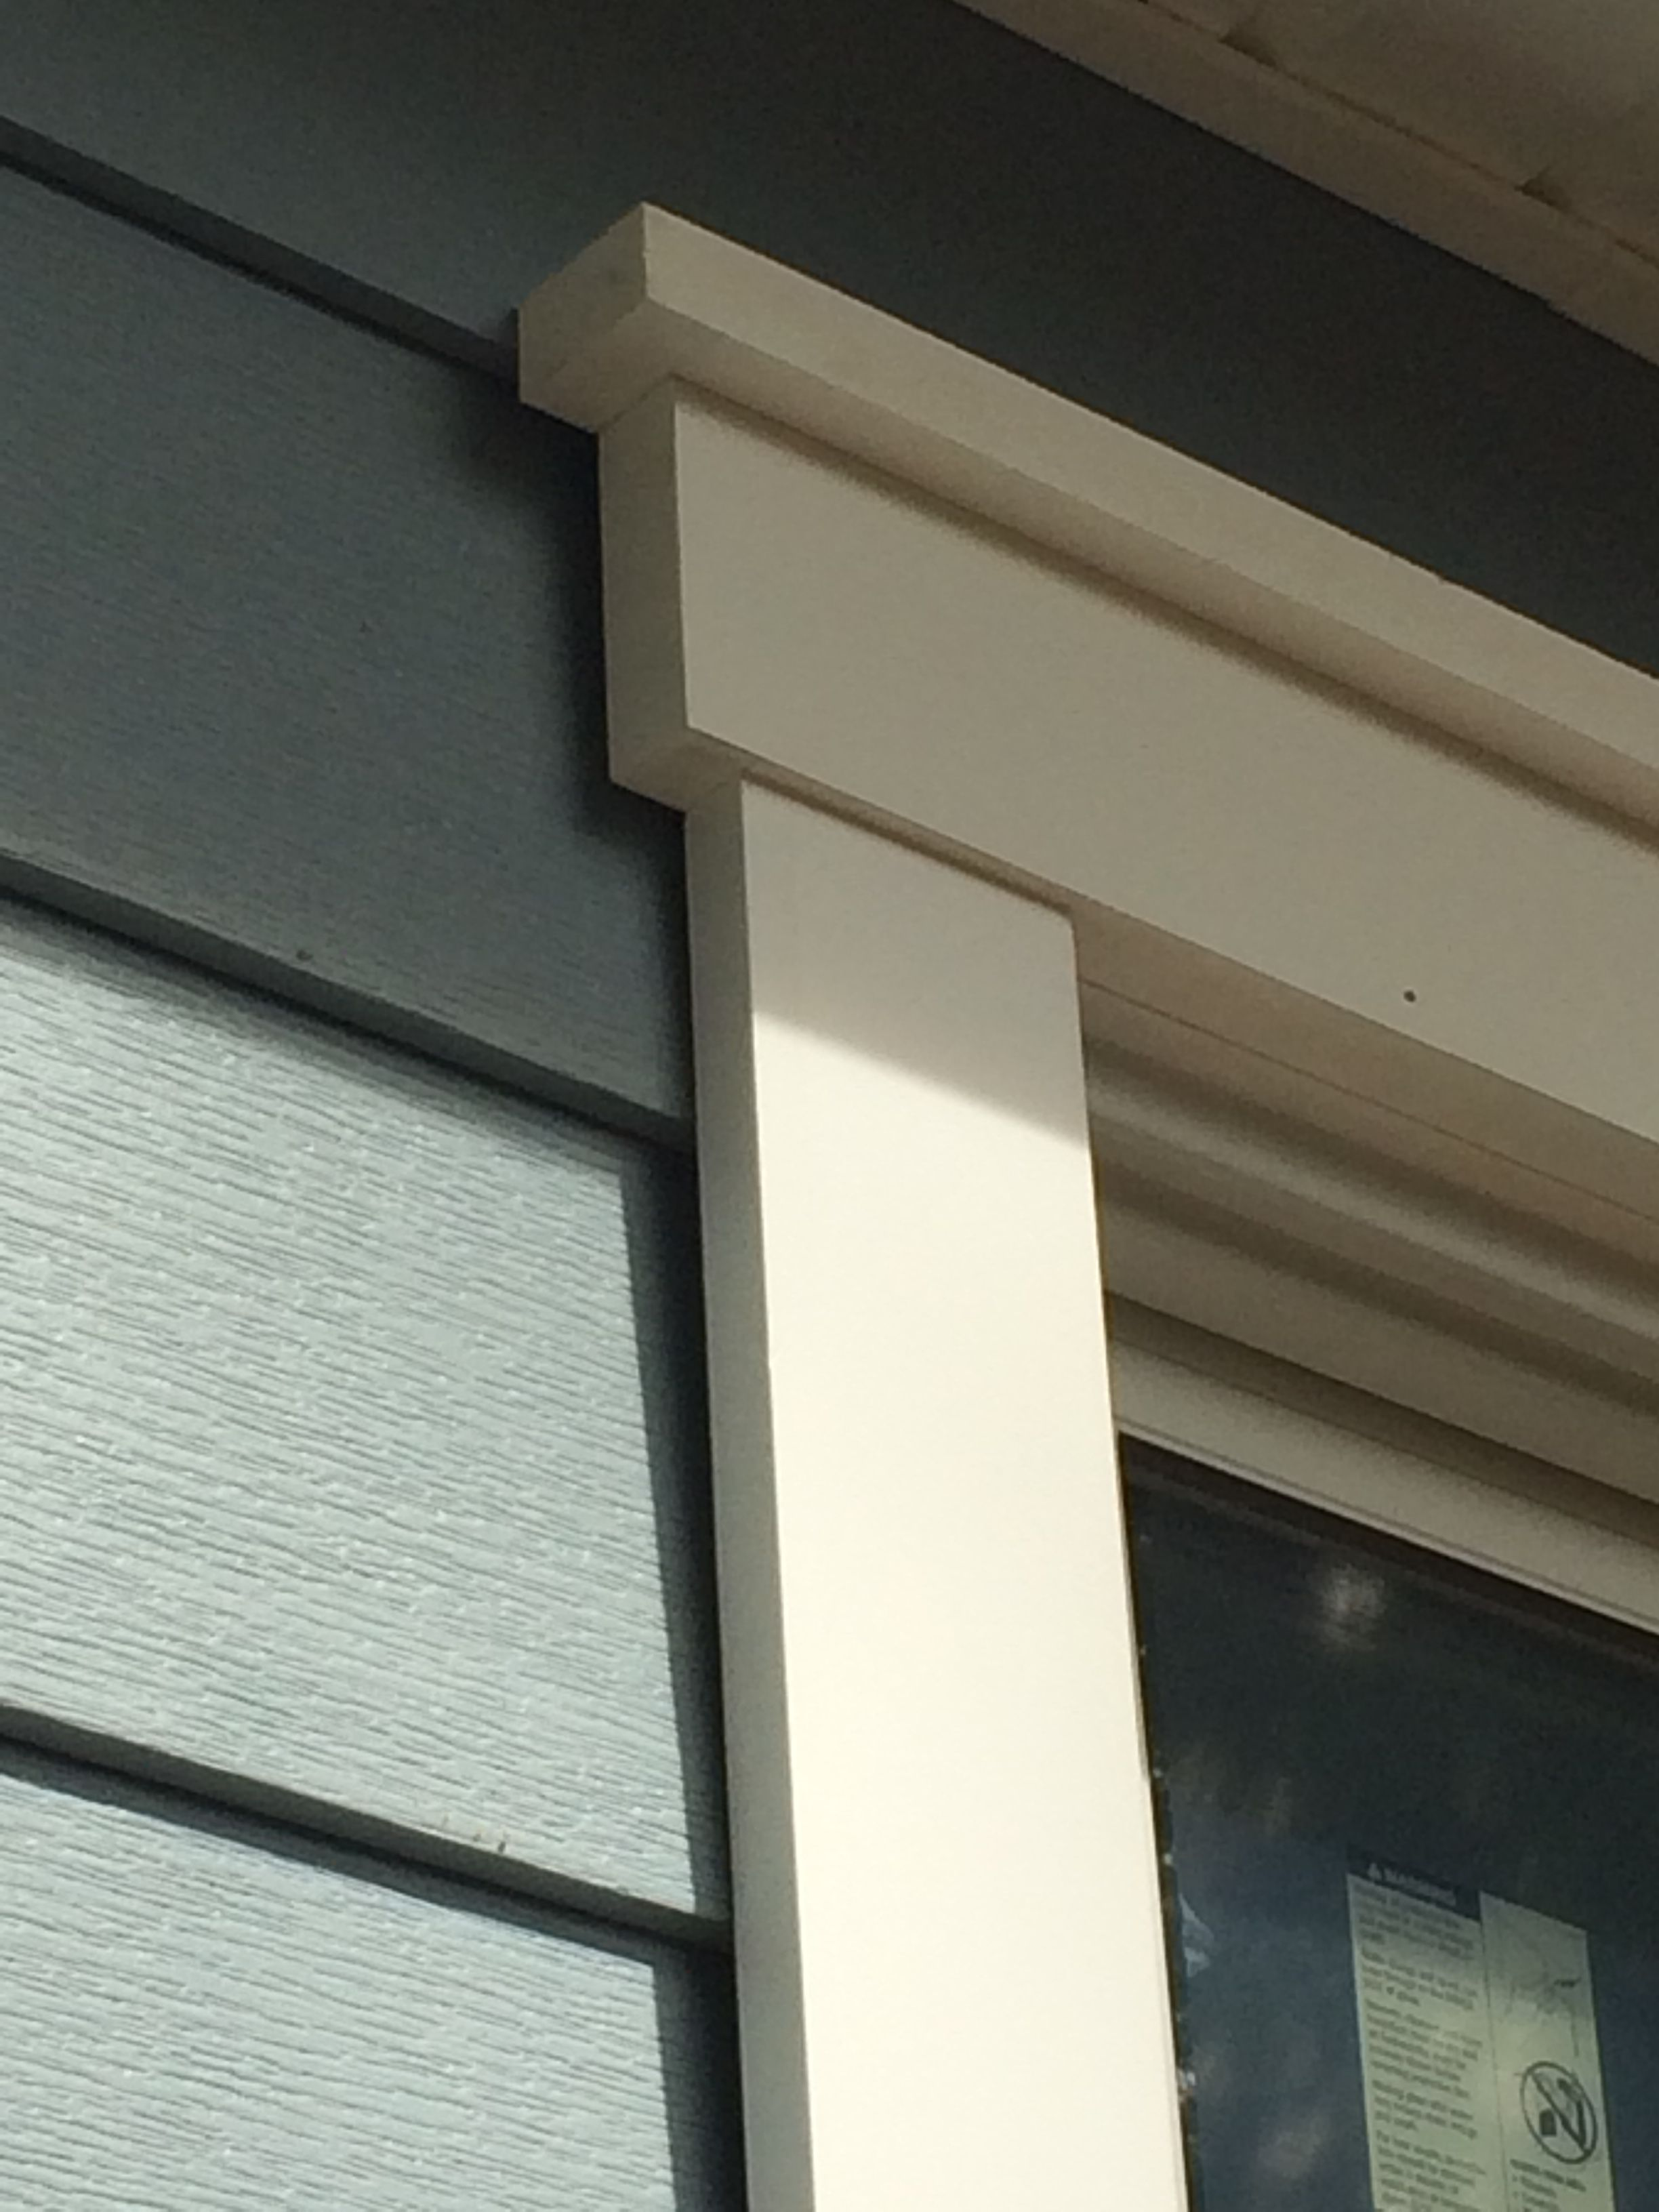 Siding Companies Hawthorne Find Siding Contractor